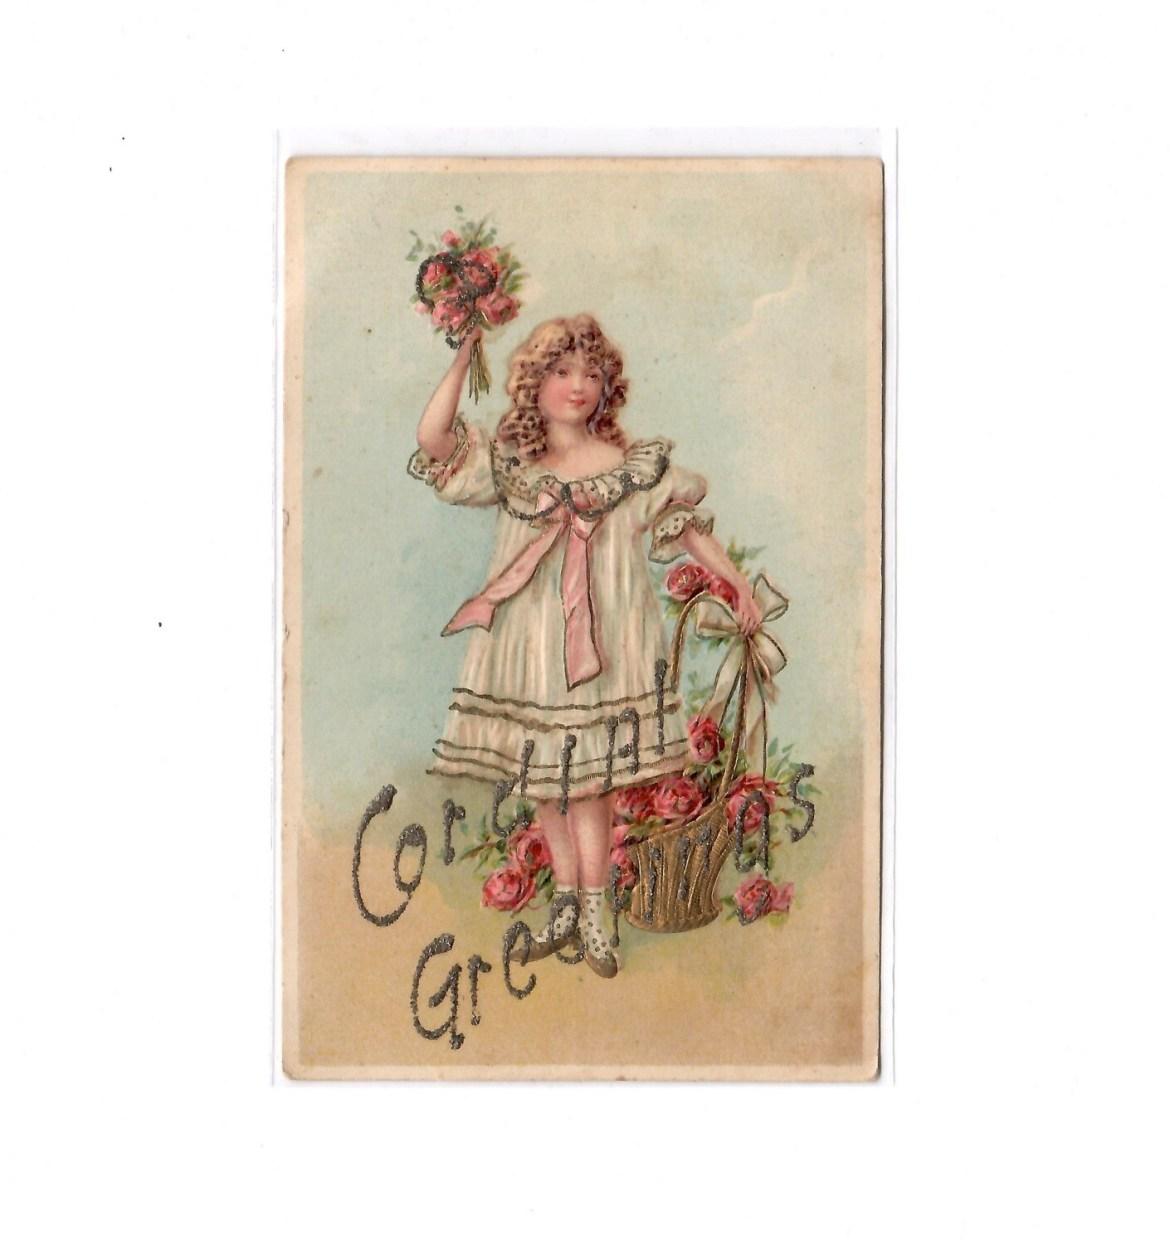 1907 Cordial Greetings Postcard